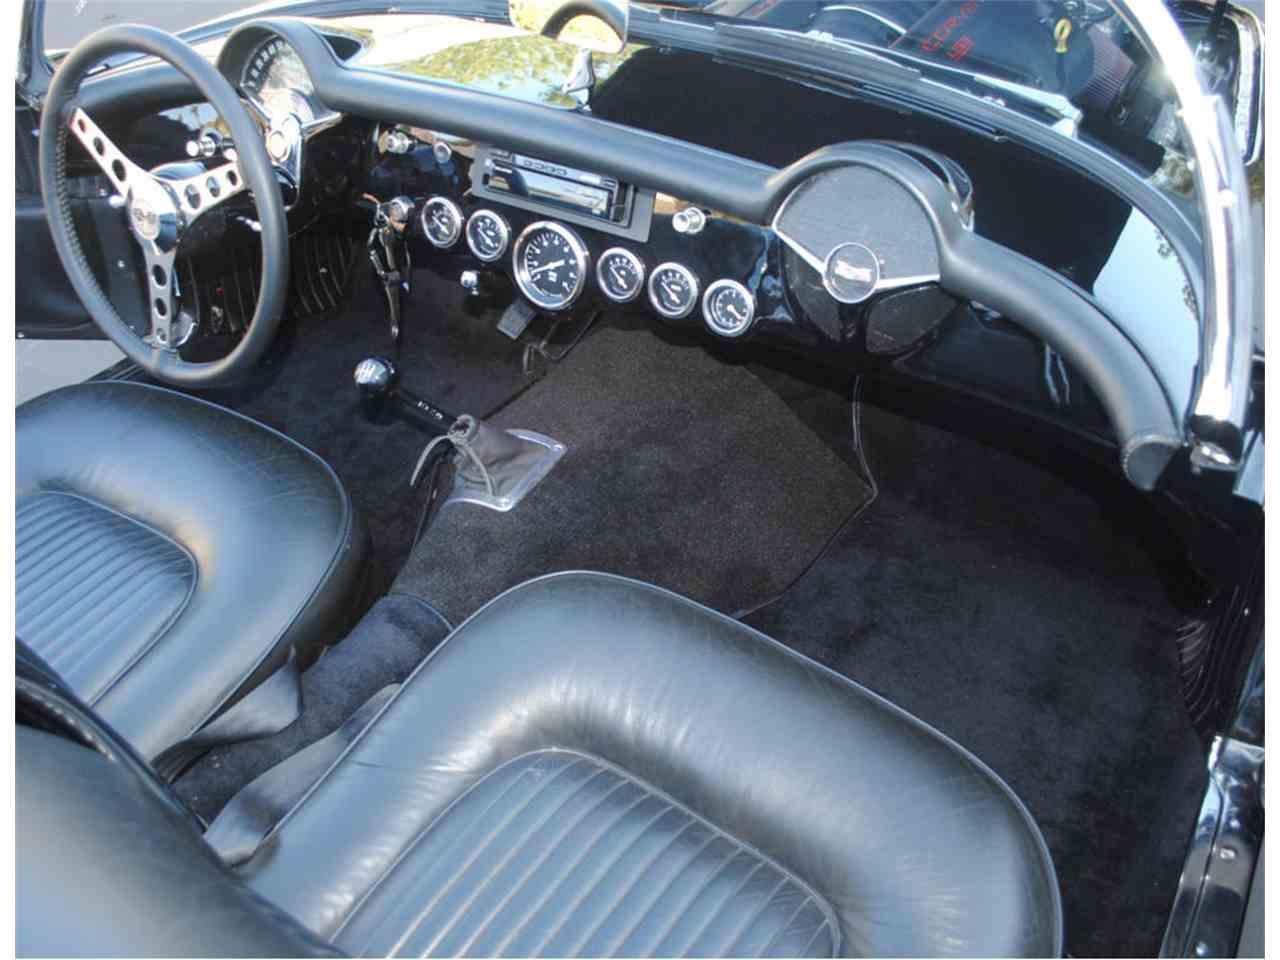 1954 Chevrolet Corvette for Sale | ClassicCars.com | CC-994464